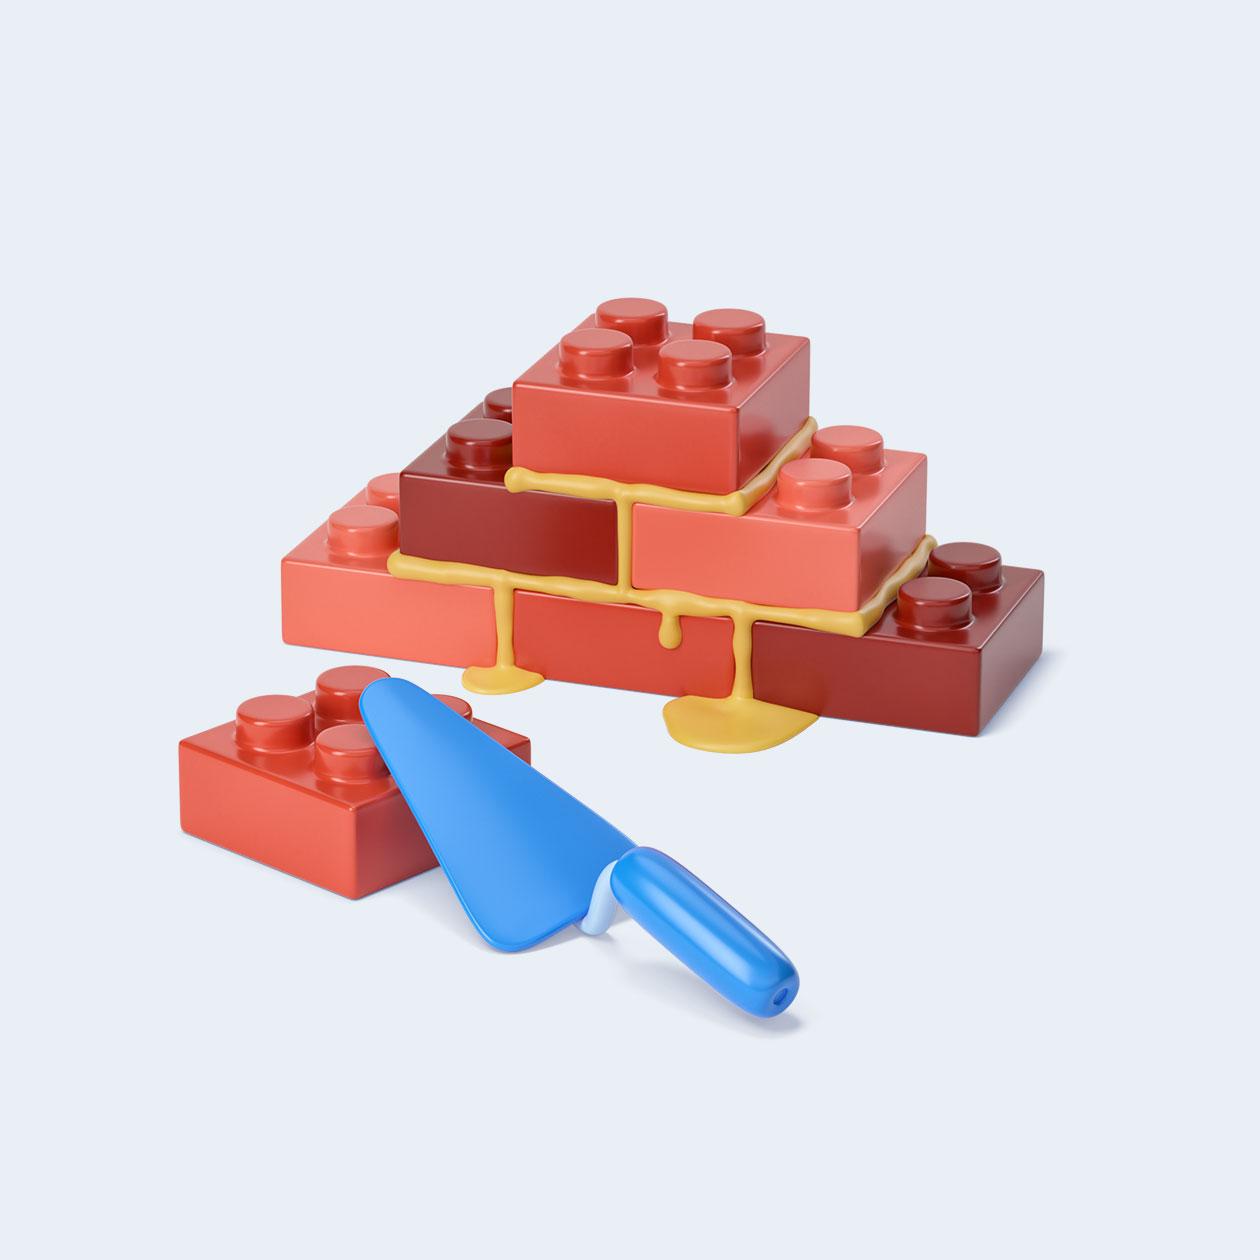 foreal_wakam_lego_wall_